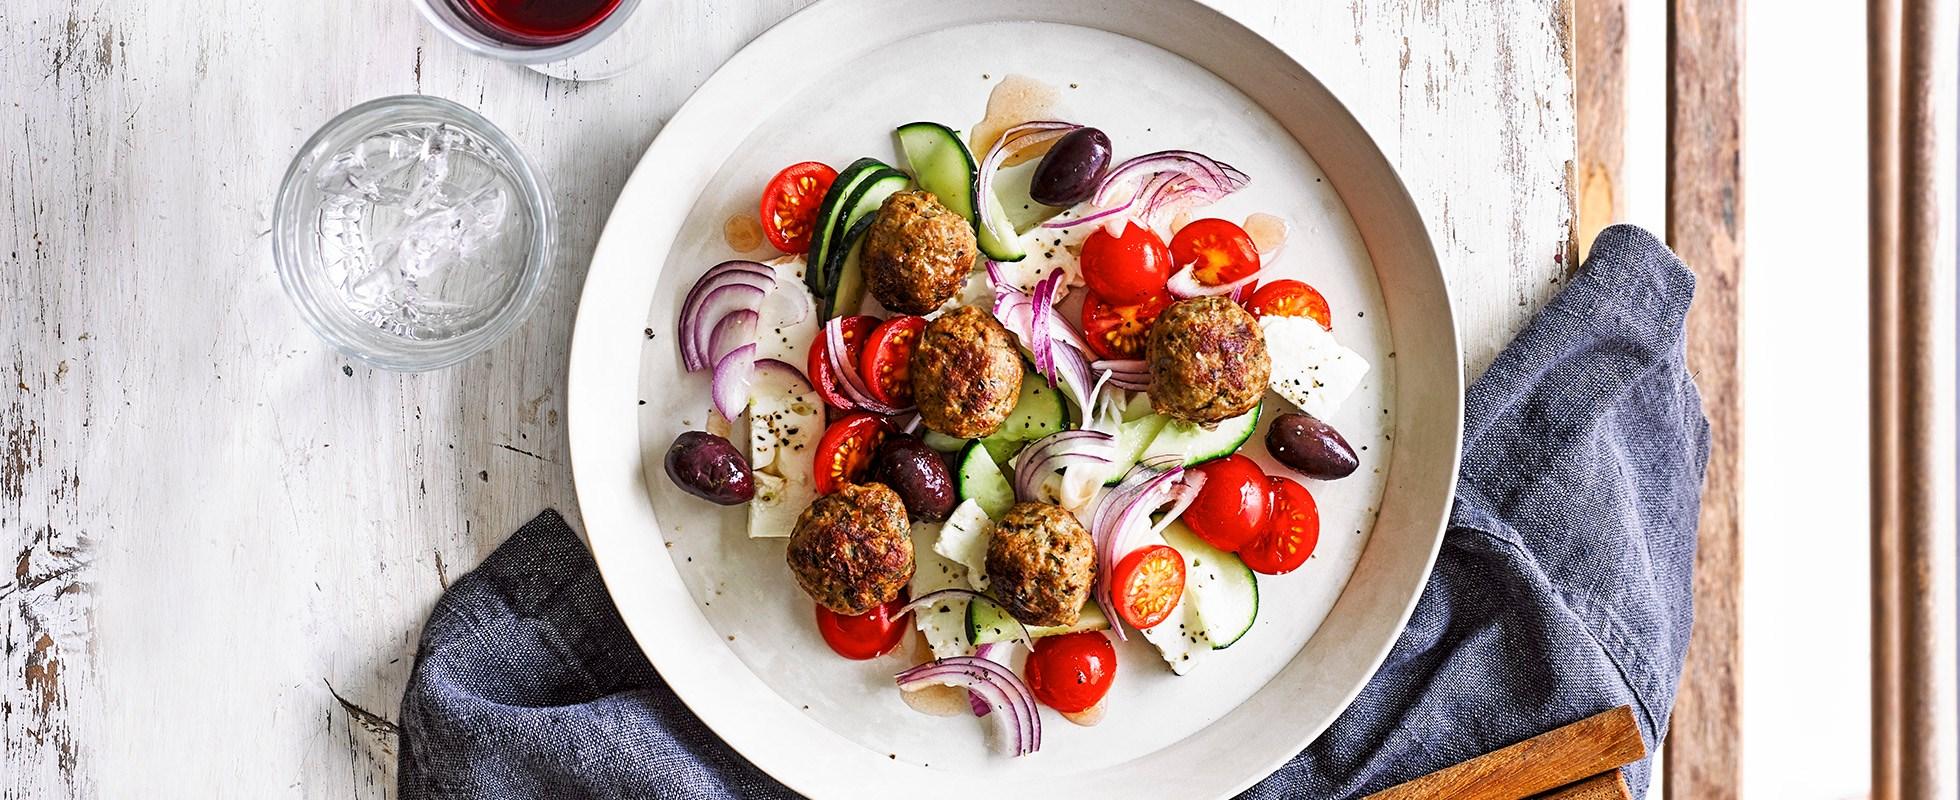 Lamb and dill meatballs with horitaki salad